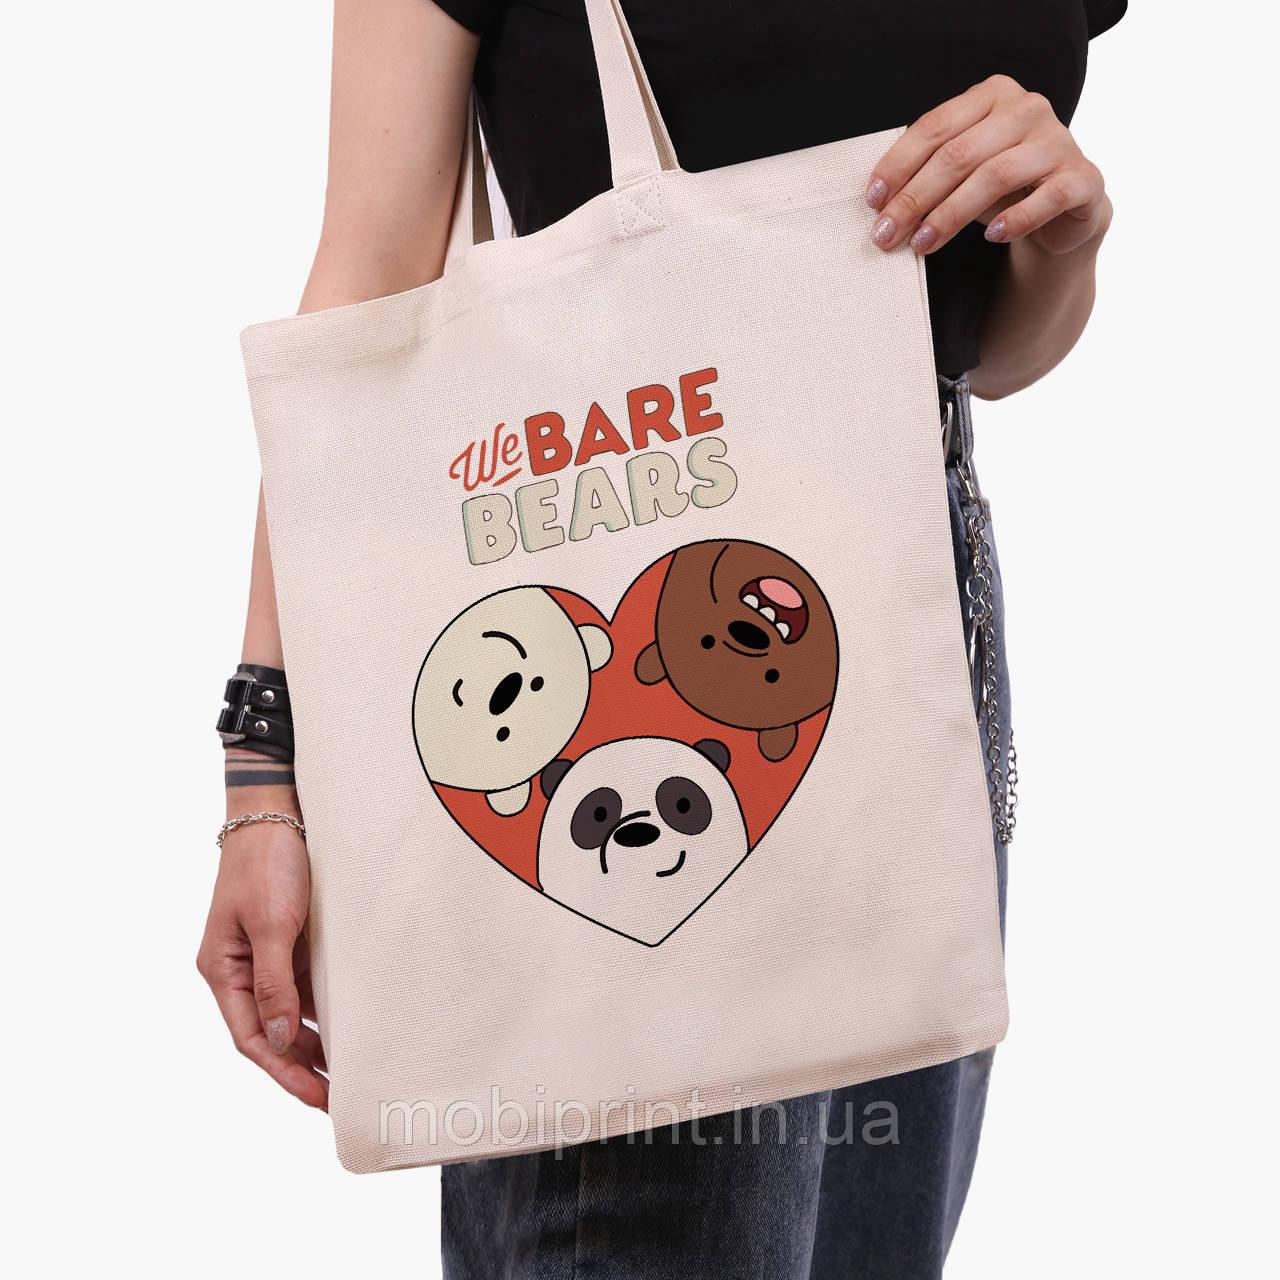 Эко сумка шоппер Вся правда о медведях (We Bare Bears) (9227-2669)  41*35 см